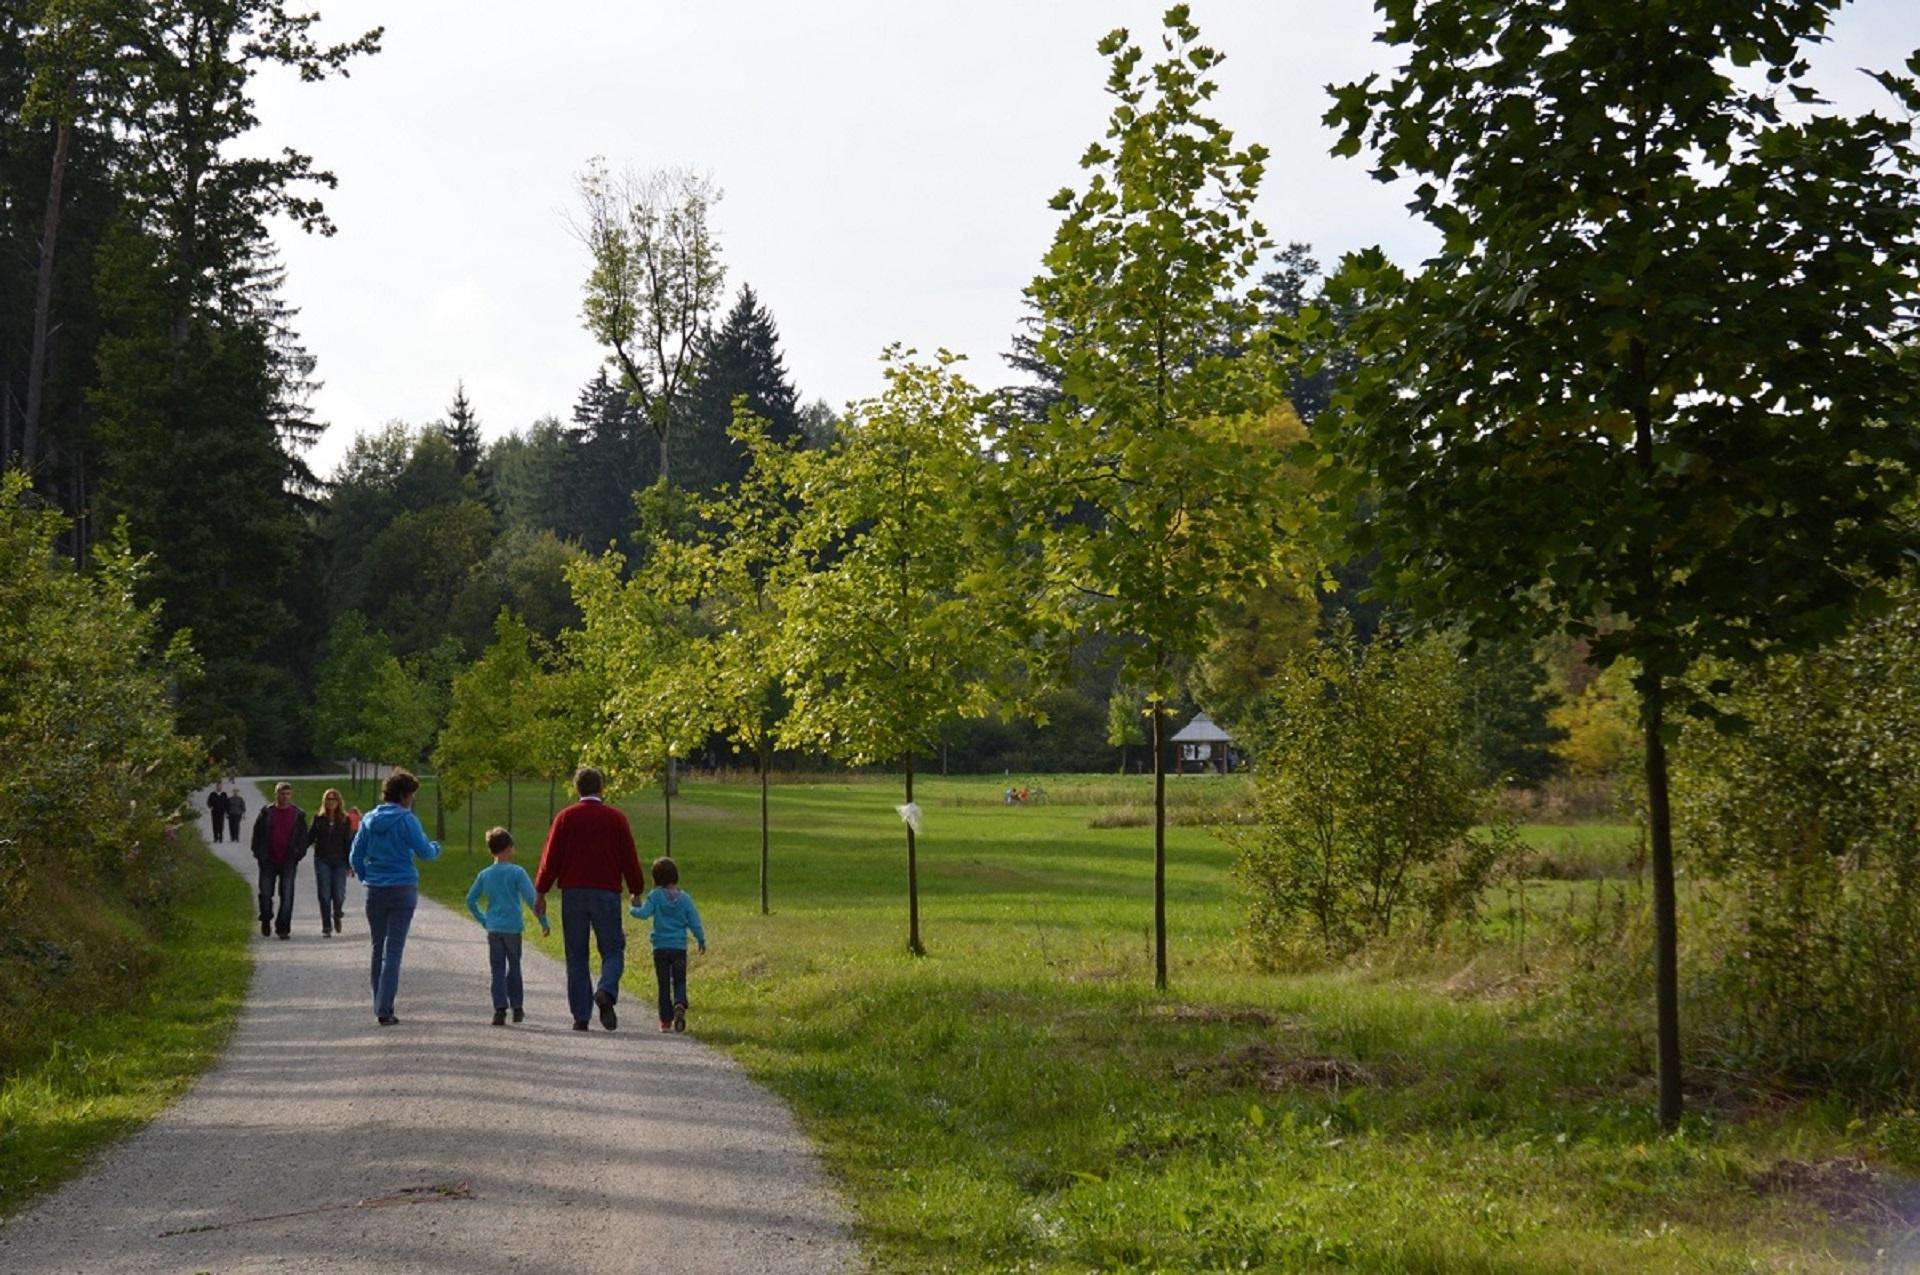 Spaziergänger im Weltwald im Kranzberger Forst